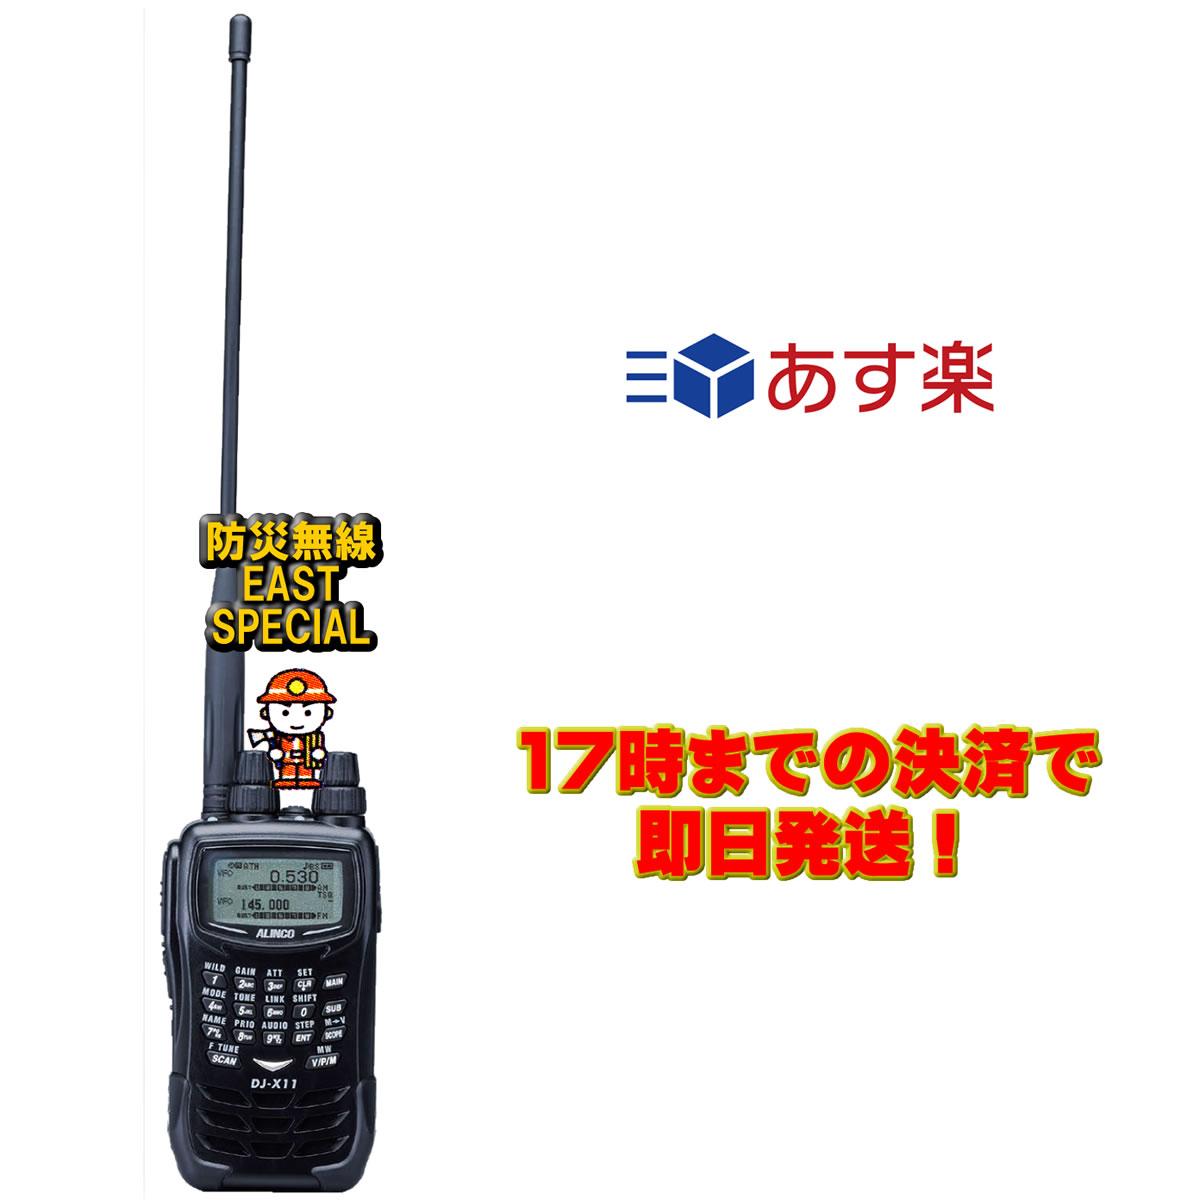 DJ-X11 アルインコ 防災無線 東日本 EAST オールモードワイドバンドレシーバー 1176chメモリー書込み済